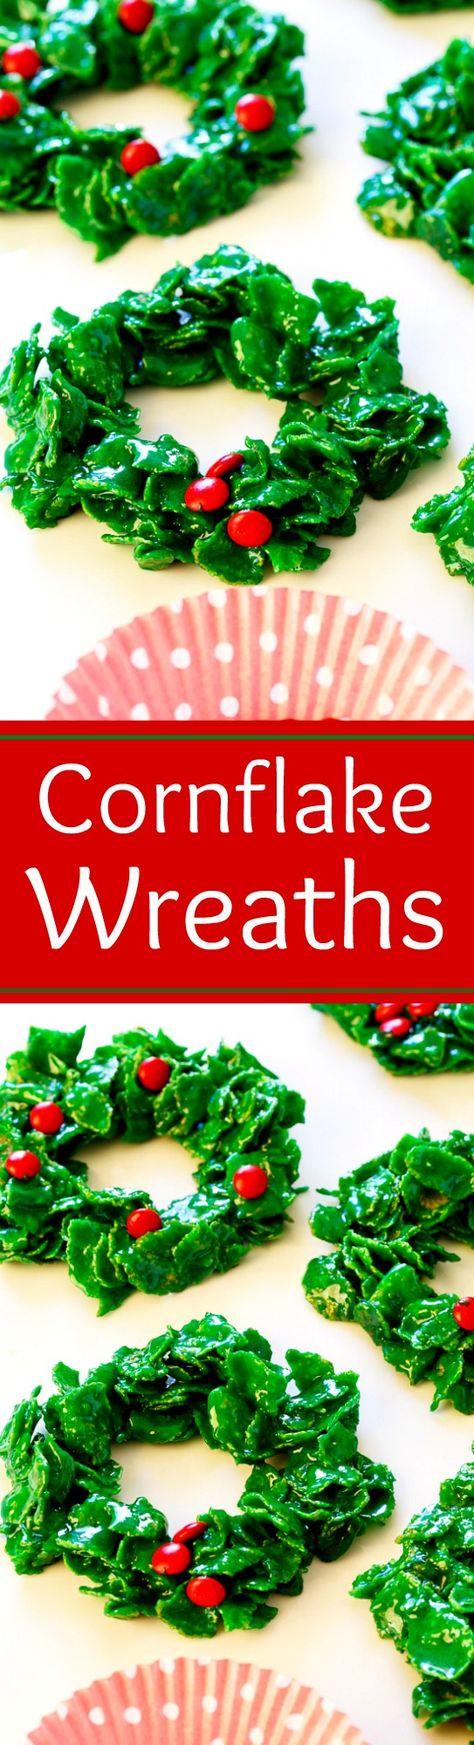 recipe: cornflake wreaths recipe [32]